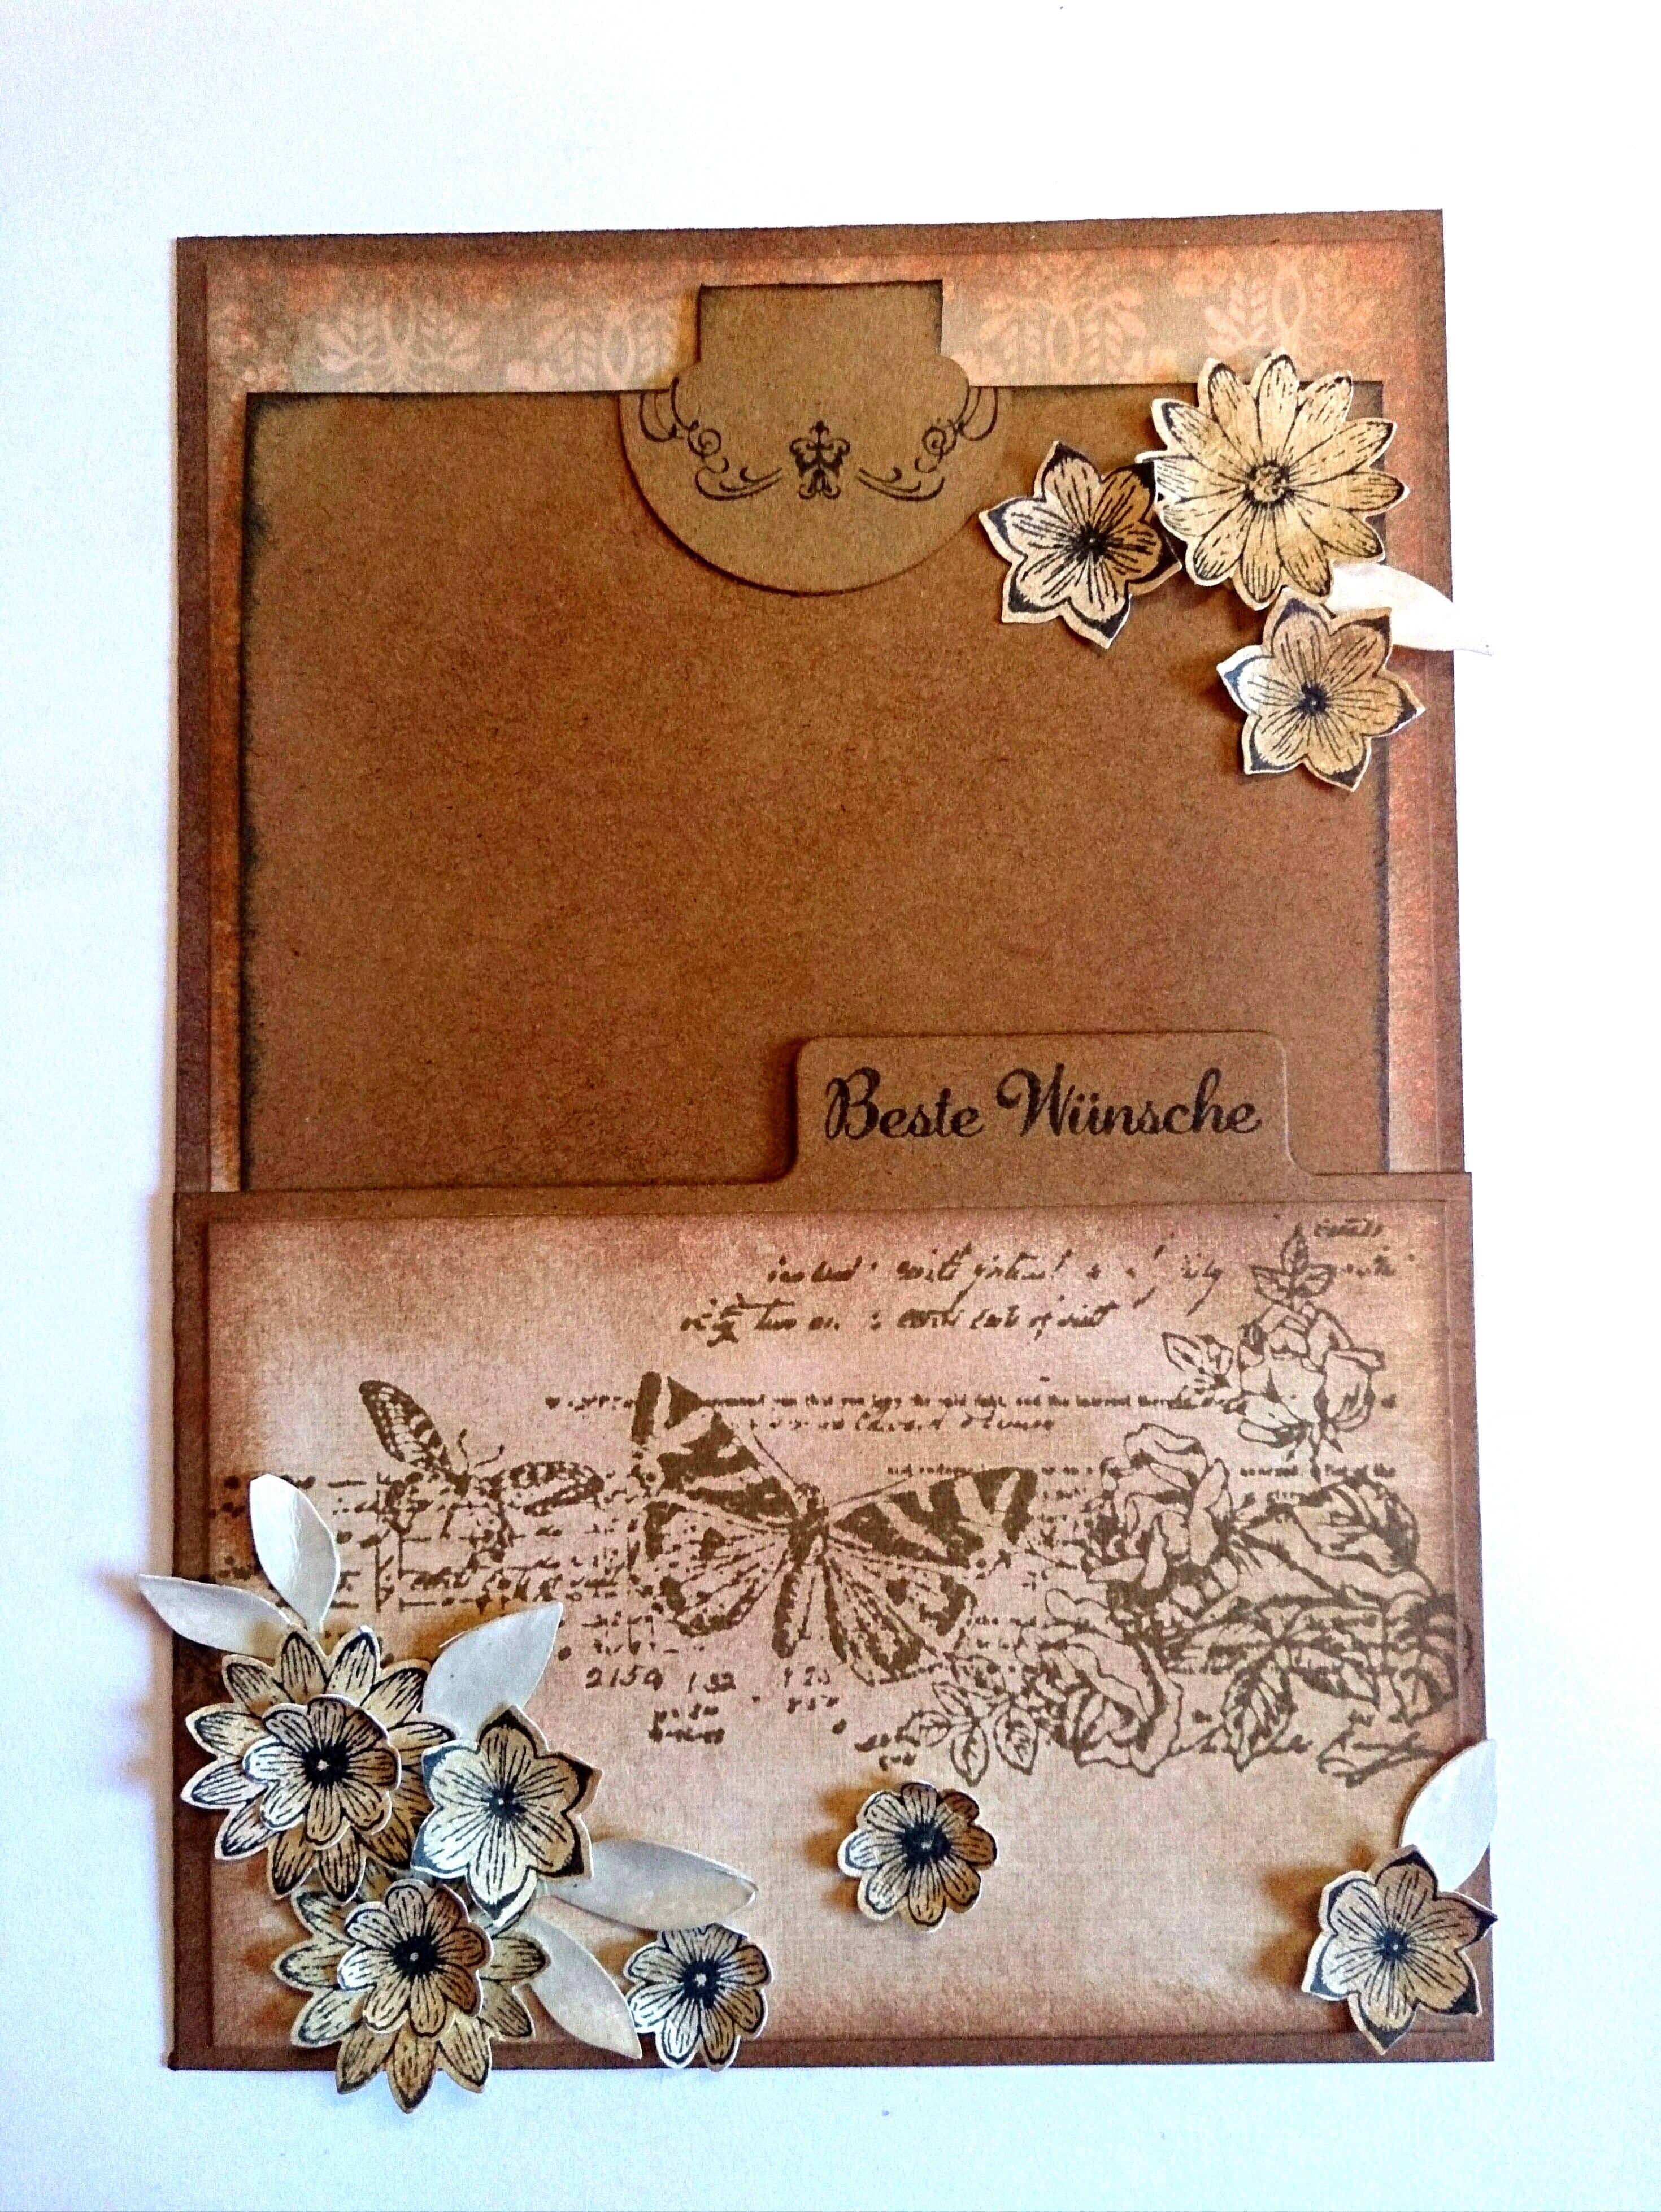 Karte im Umschlag, vintage style